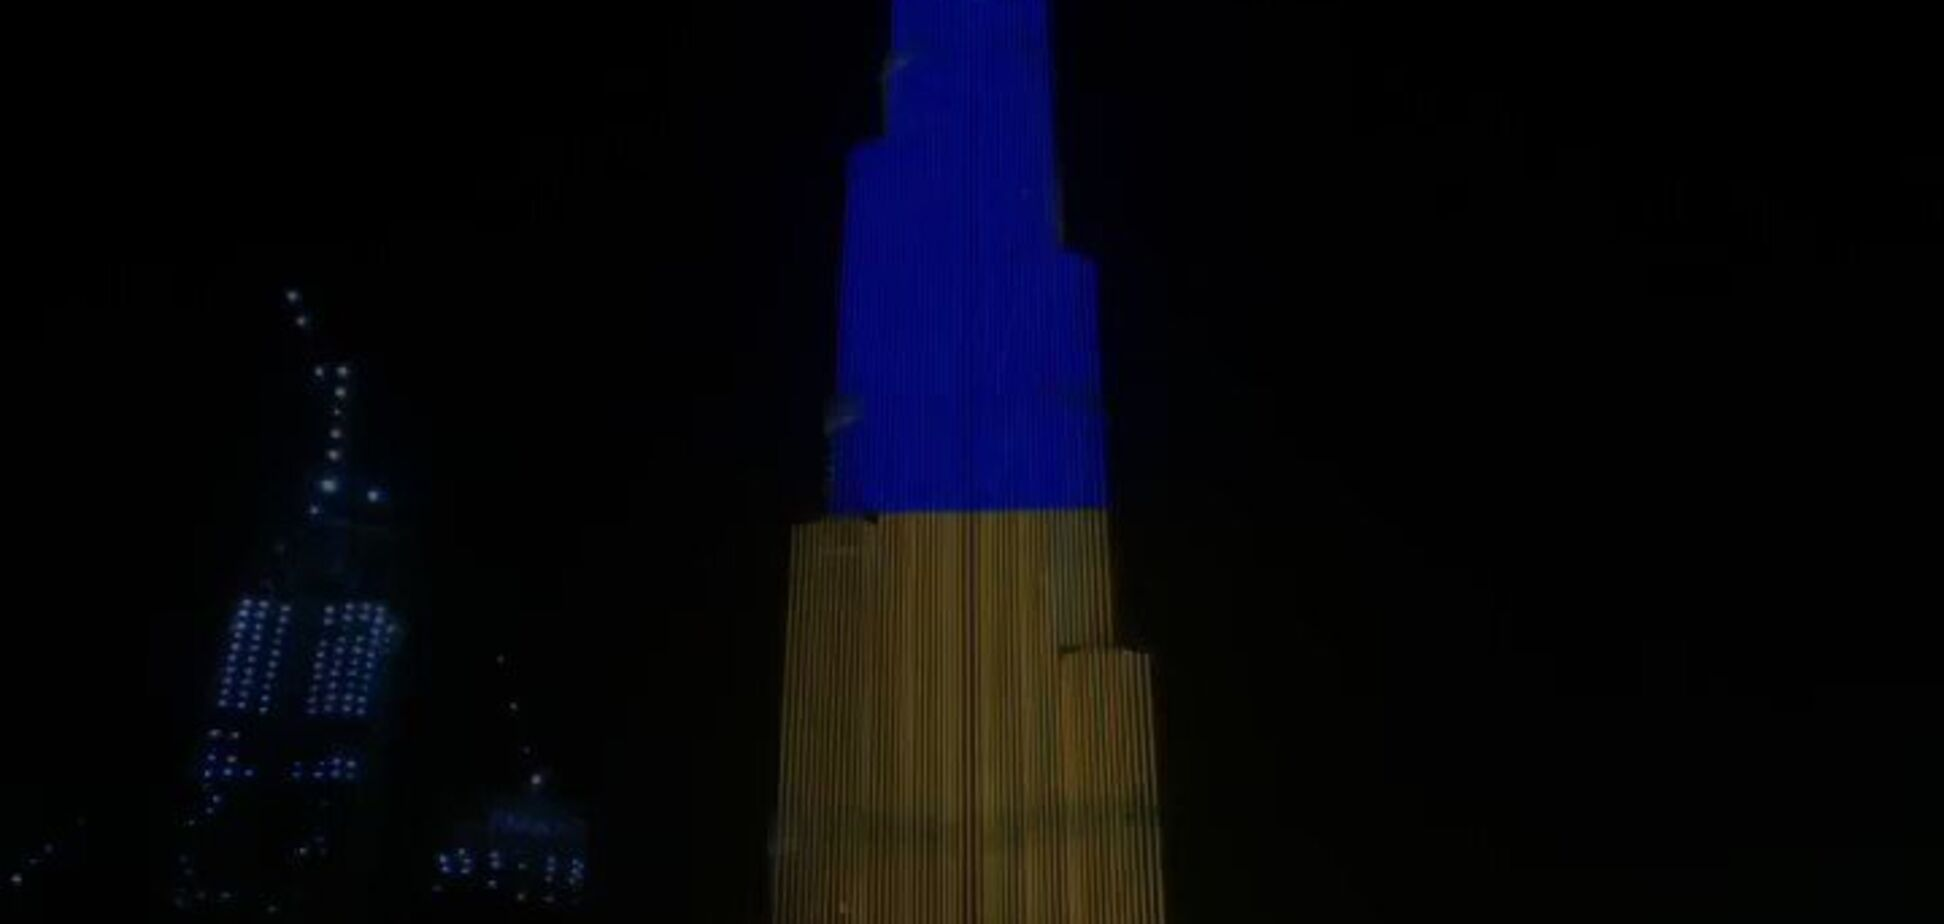 Бурдж-Халифа и Ниагарский водопад подсветили в цветах украинского флага